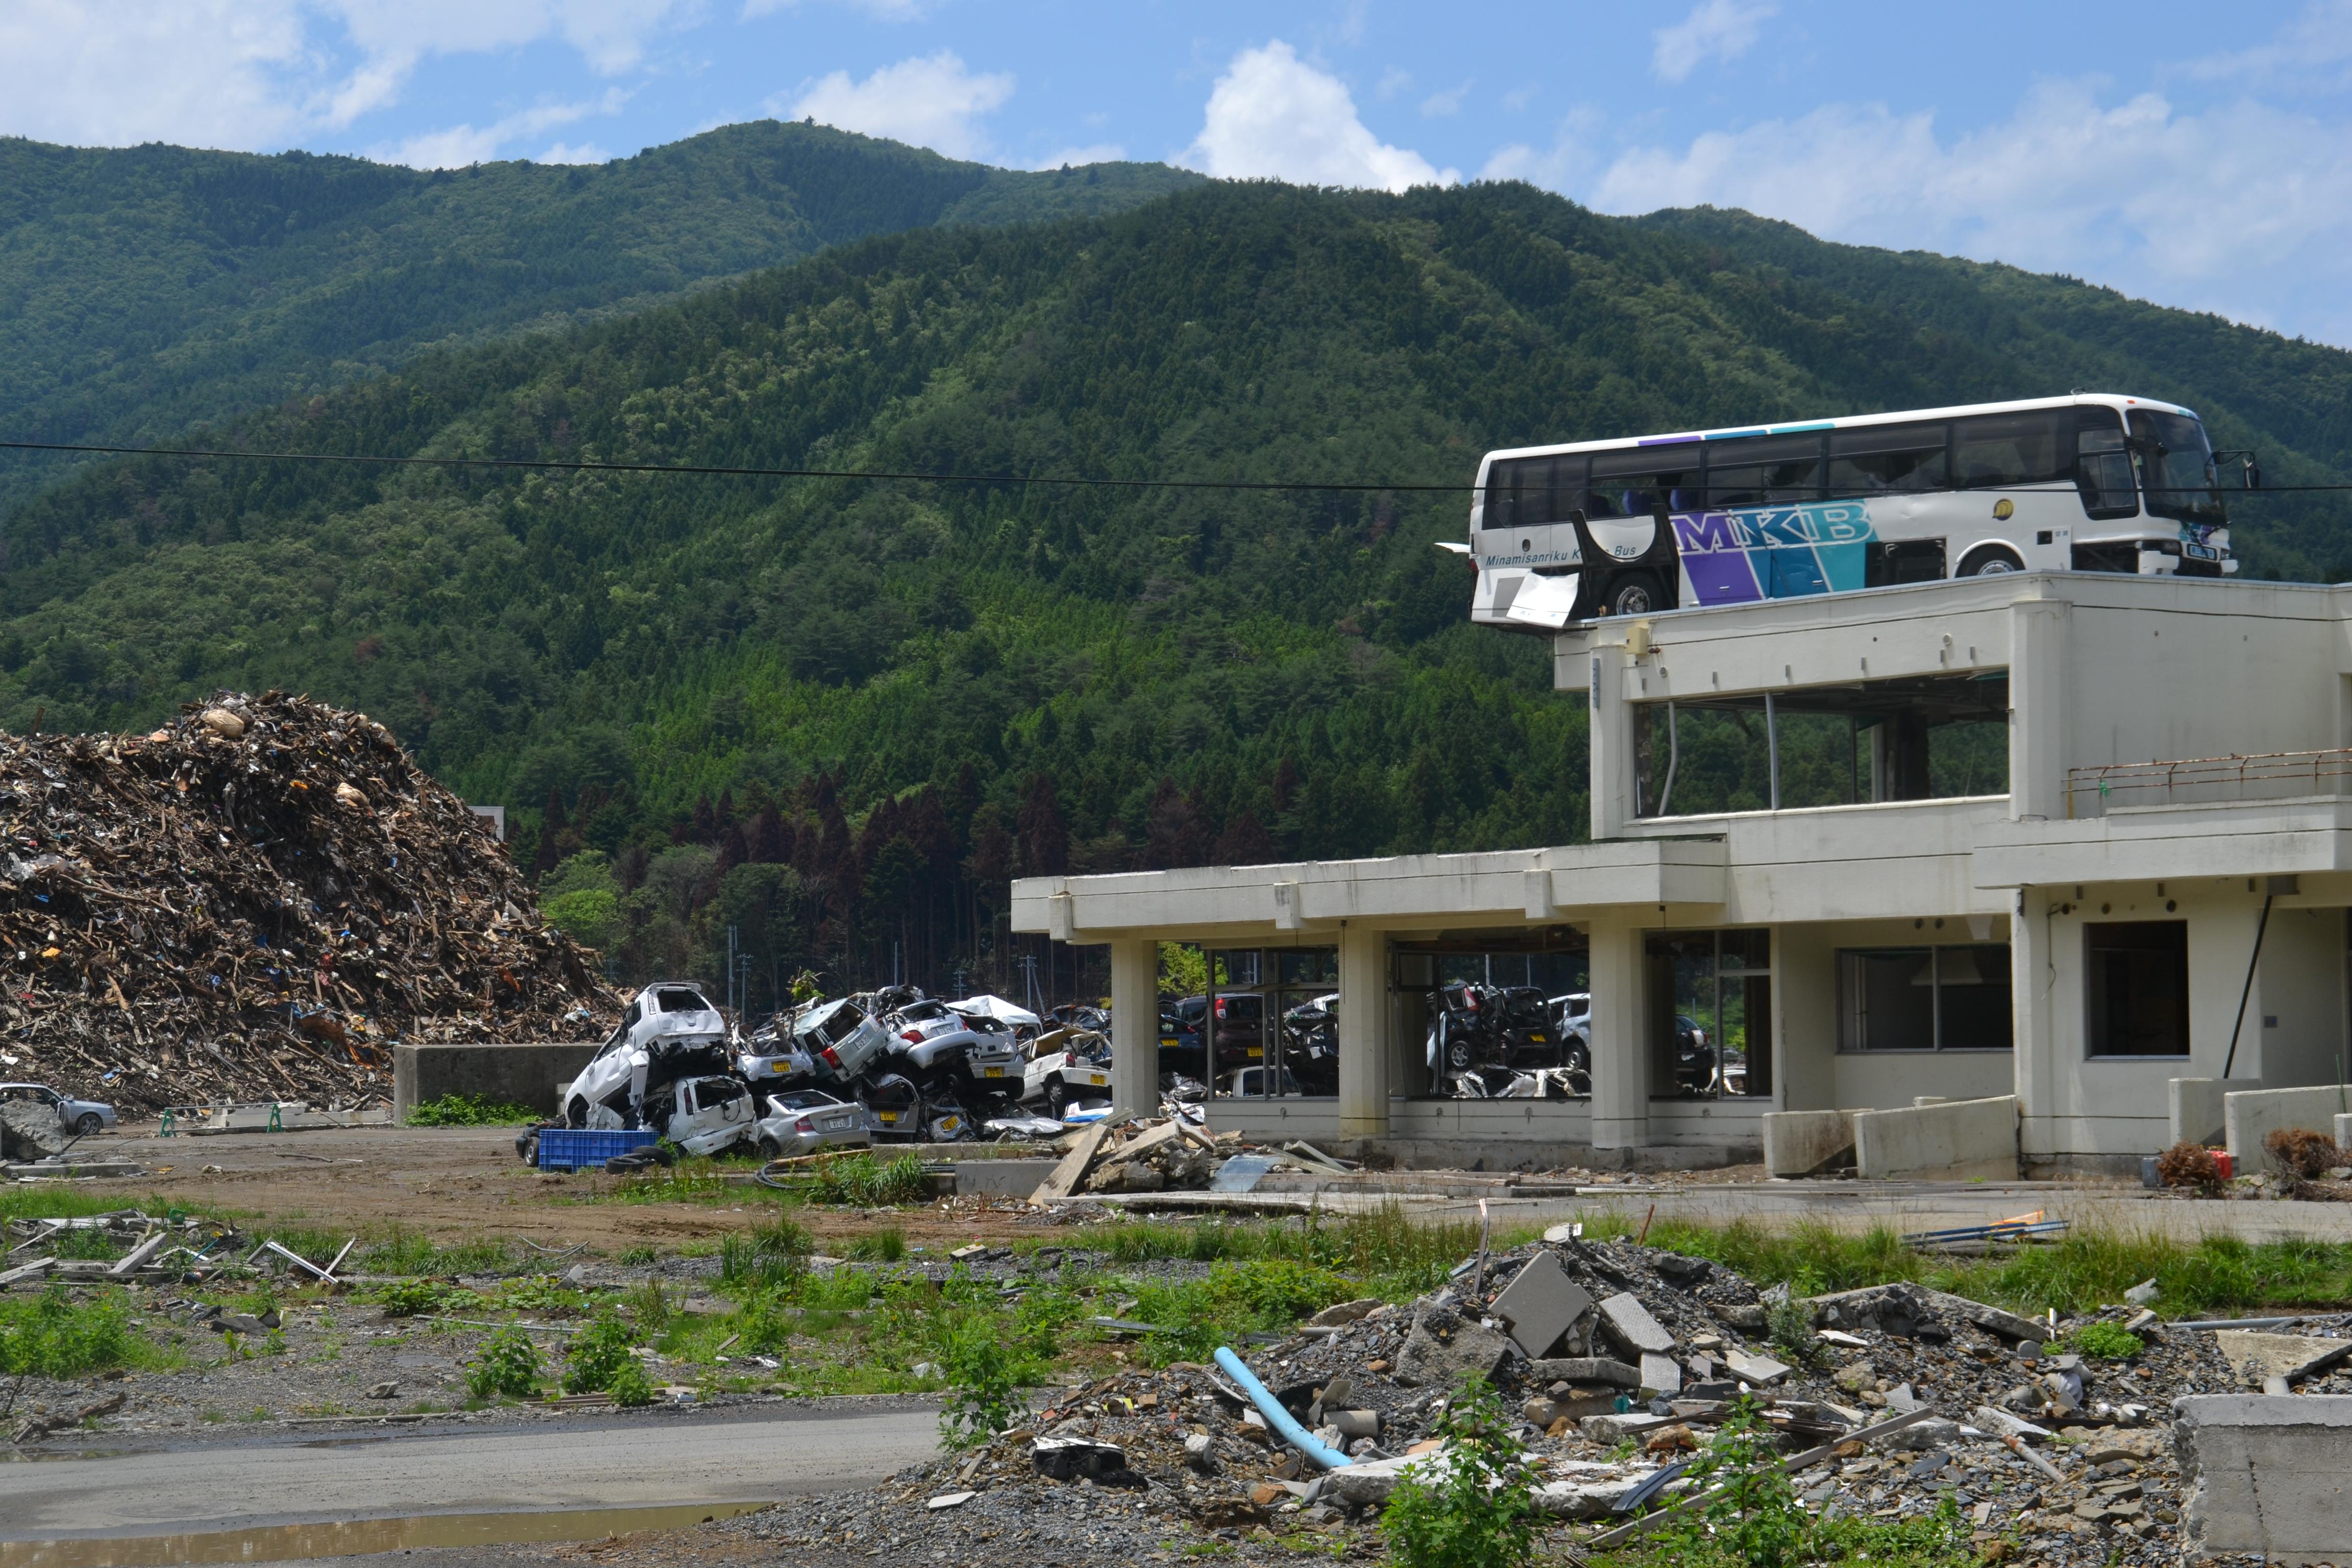 onagawa bus on top of building rubble.JPG